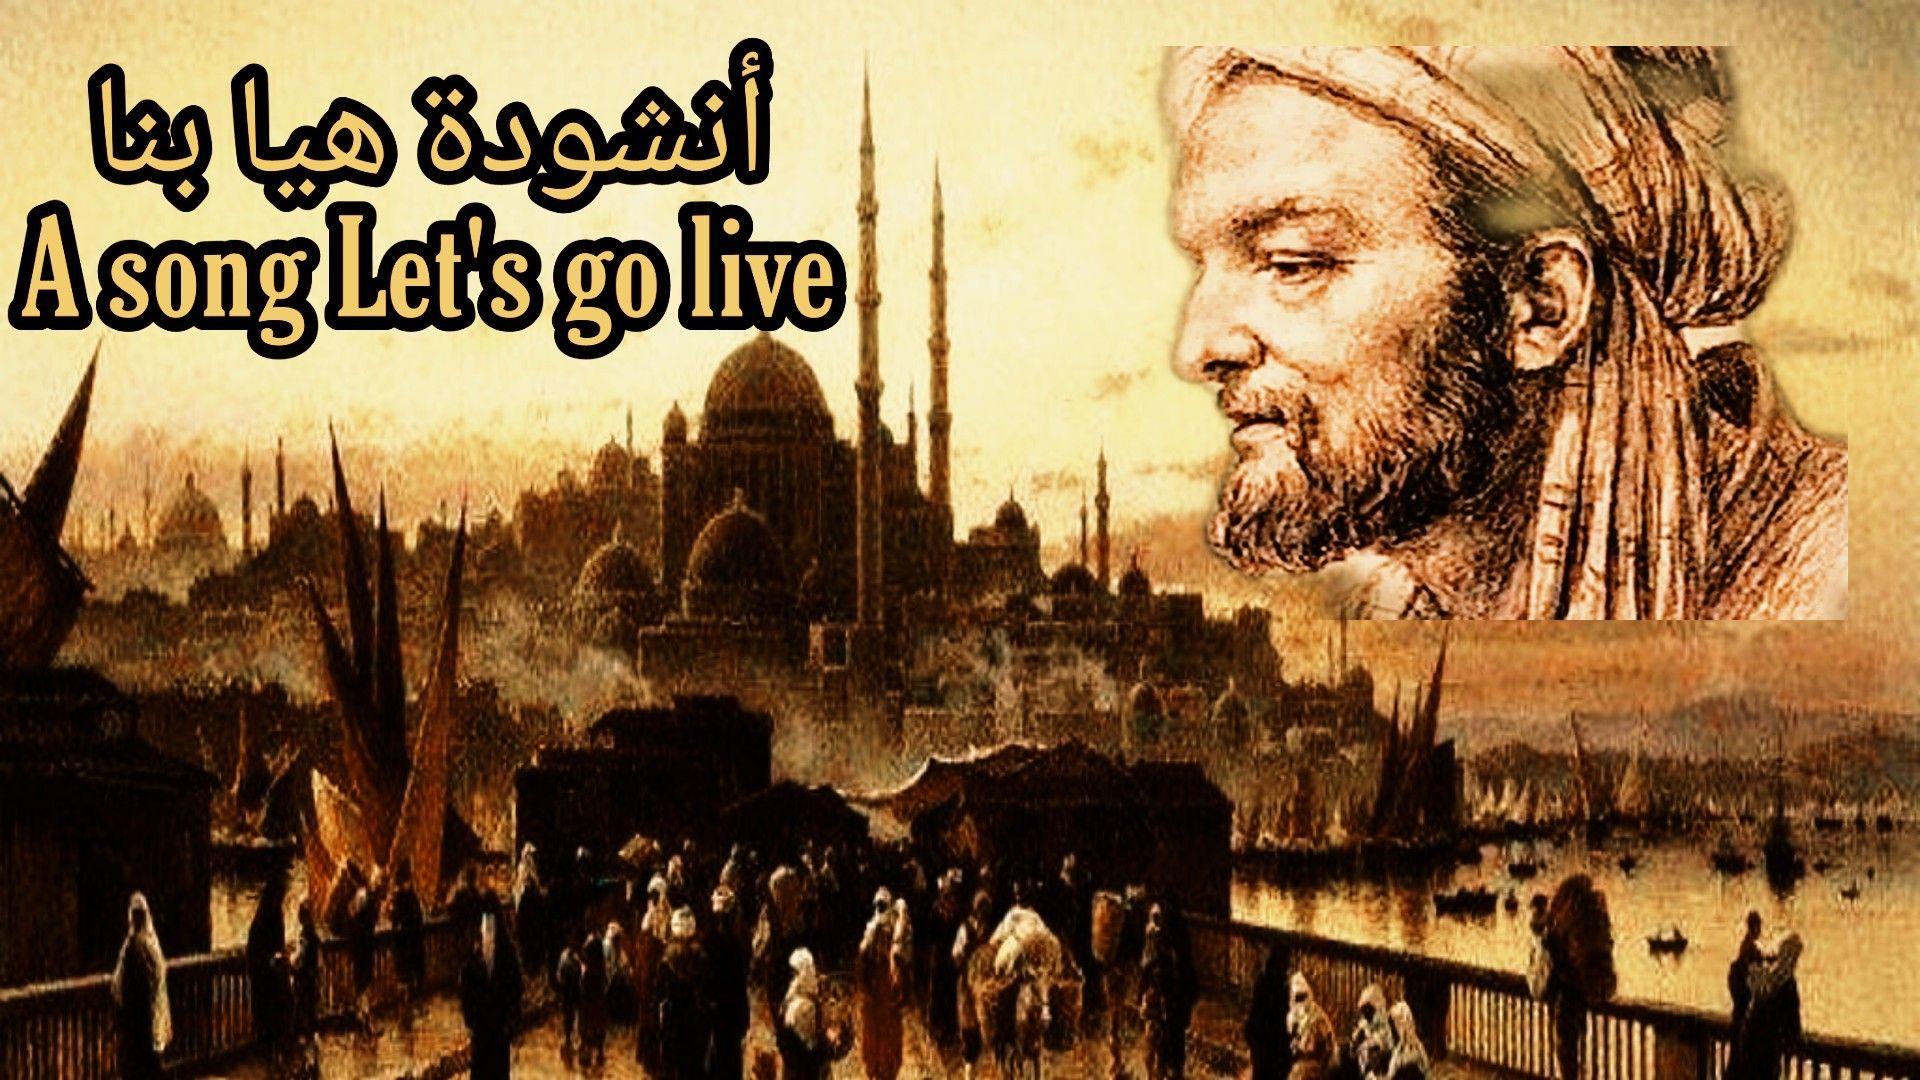 أنشودة هيا بنا A Song Let S Go Live In 2020 Ramadan Kareem Movie Posters Ramadan